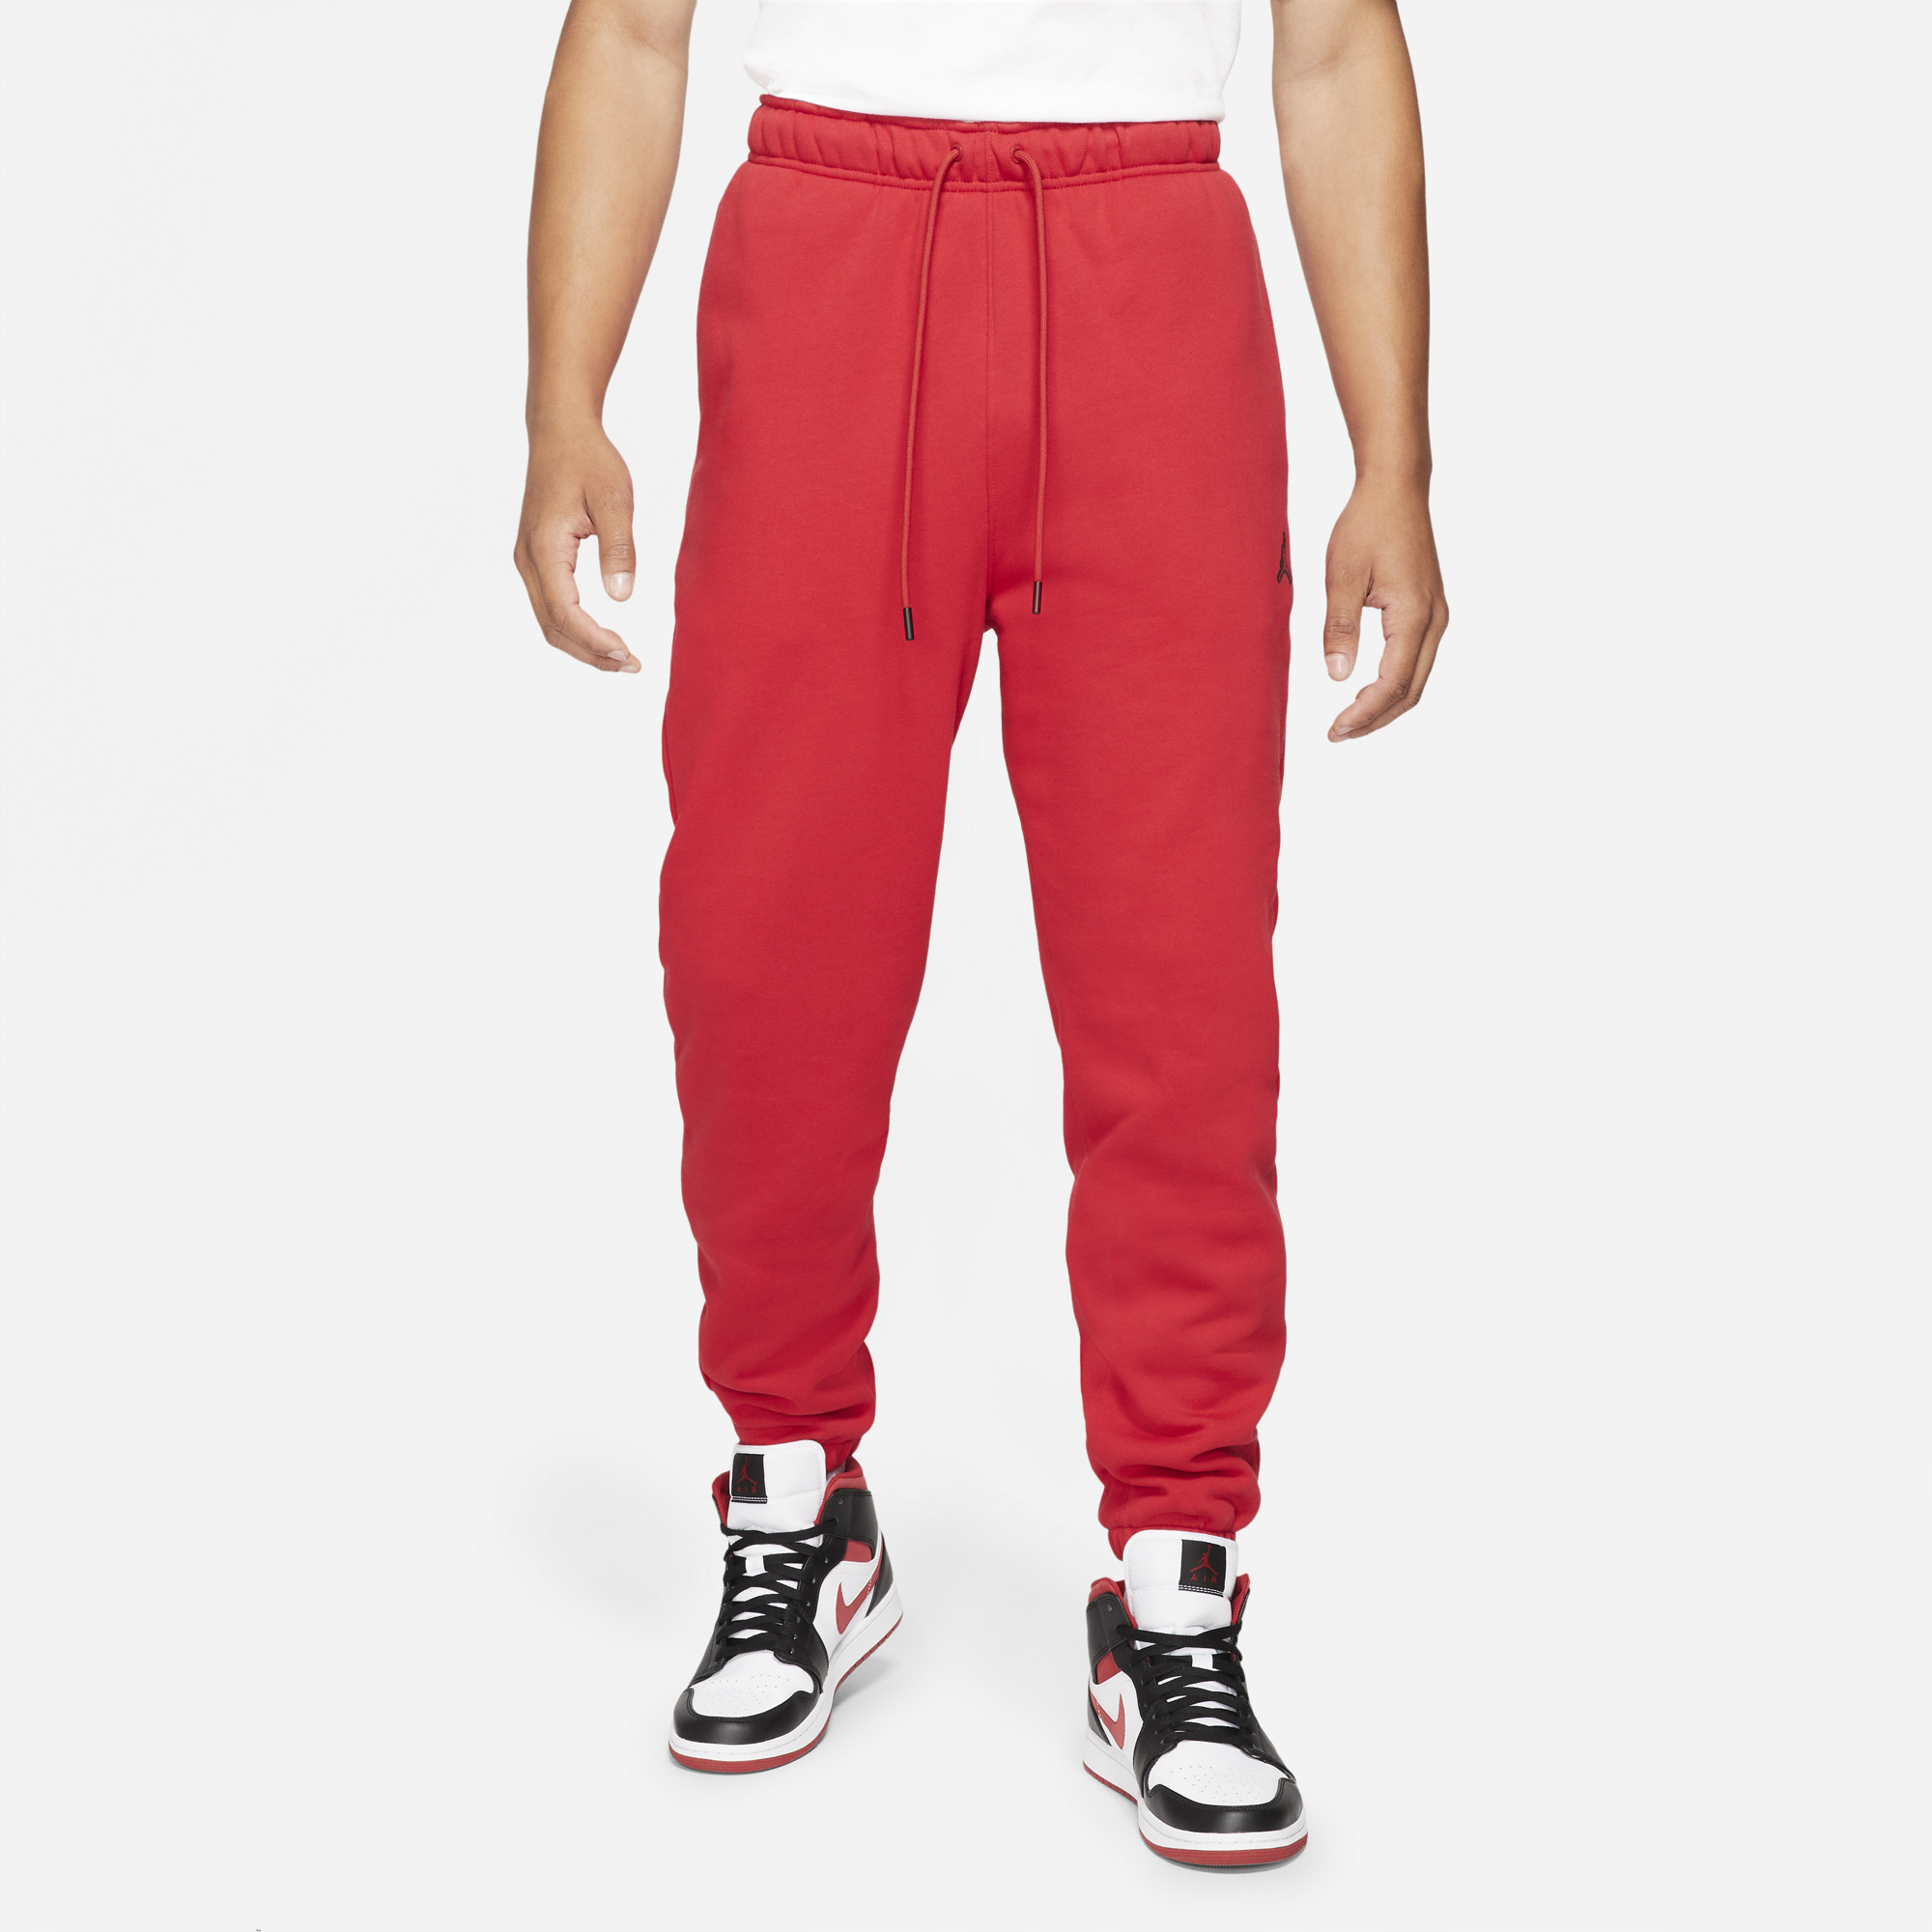 jordan-essential-fleece-pants-gym-red